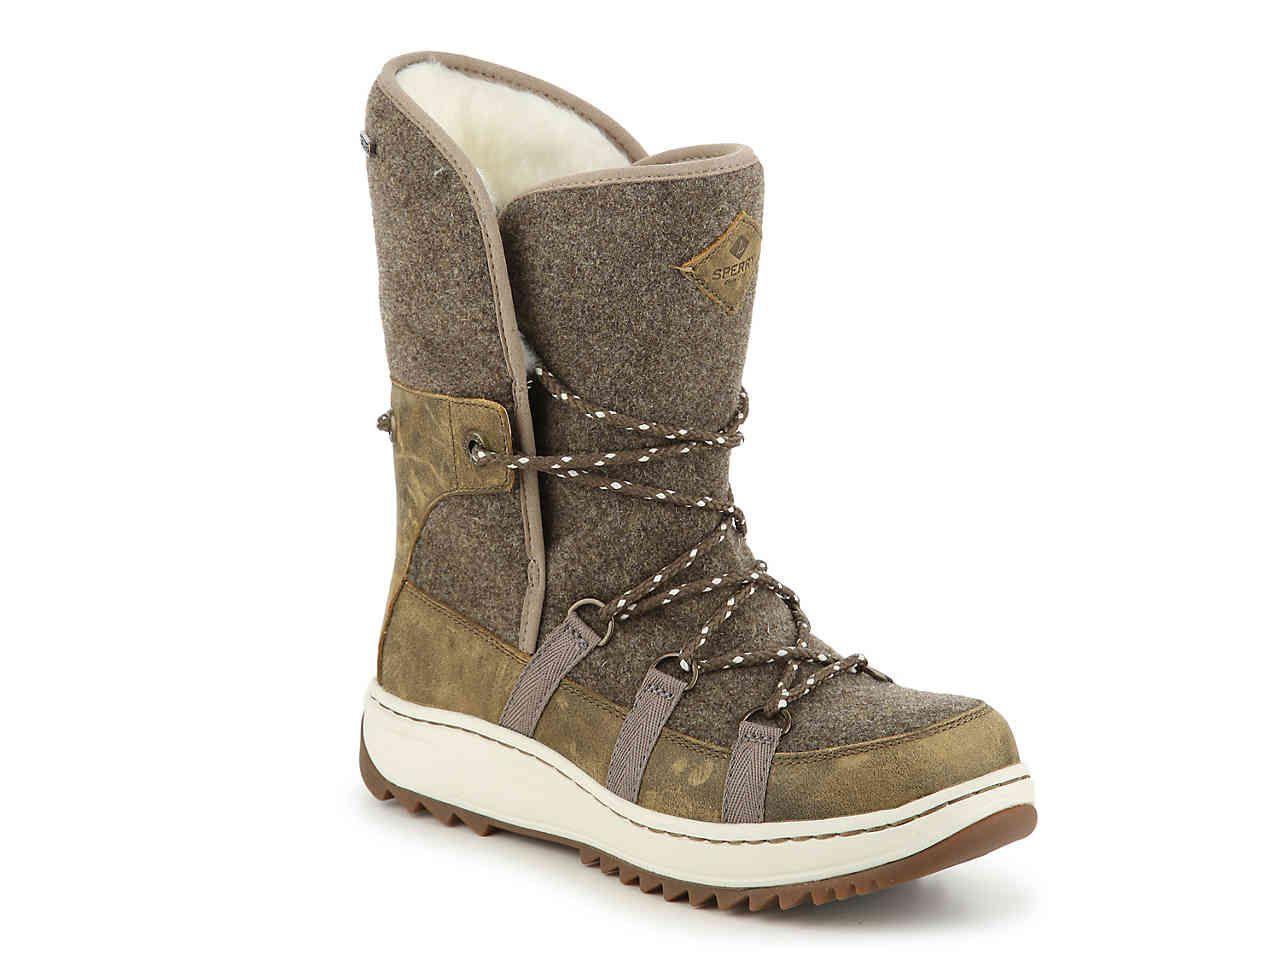 Powder Ice Cap Snow Boot | Boots, Snow